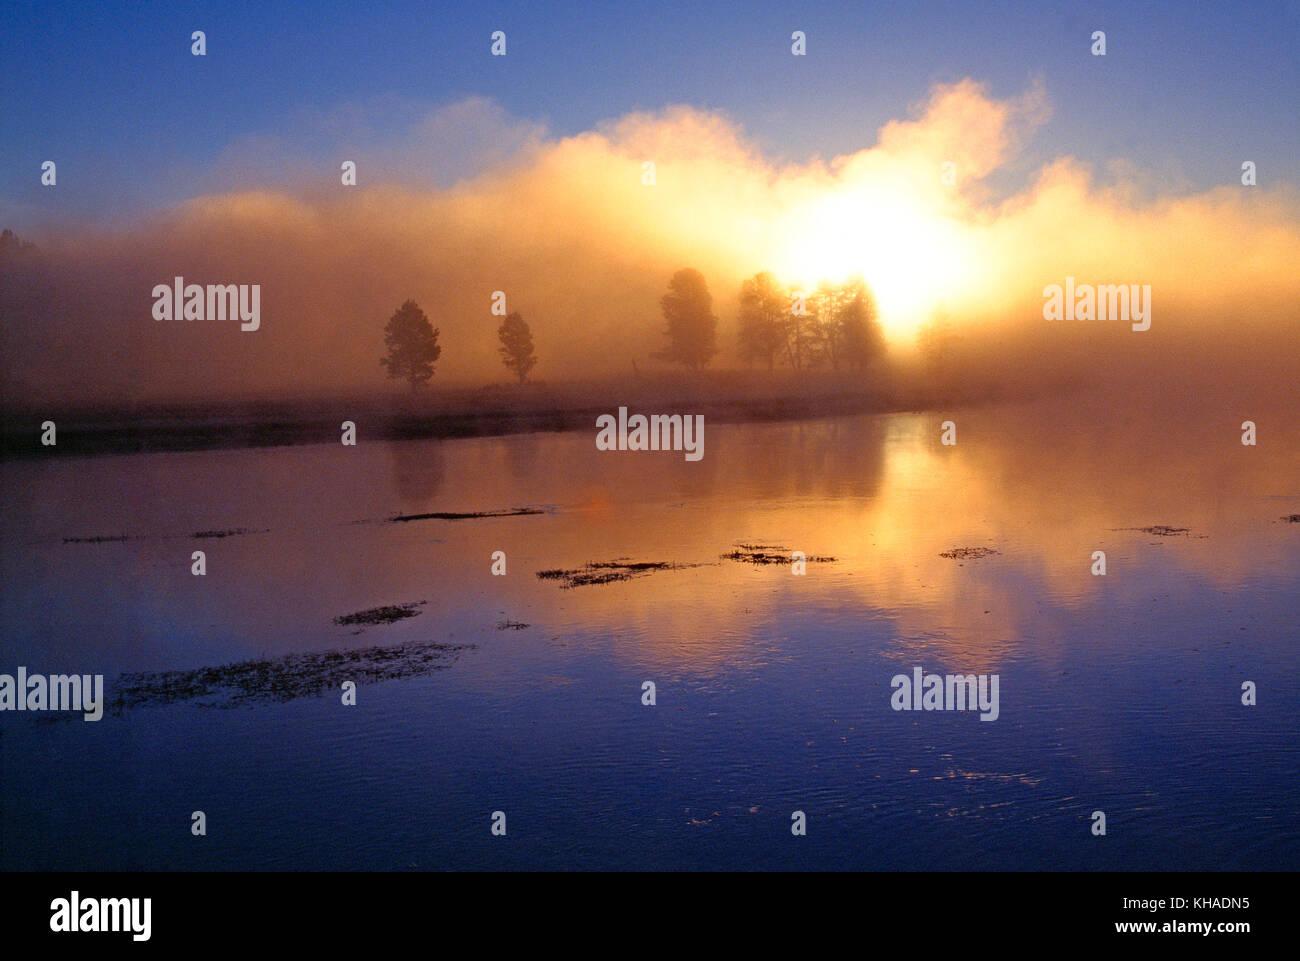 USA. Wyoming. Yellowstone National Park. Misty sunrise over Alum Creek. Stock Photo